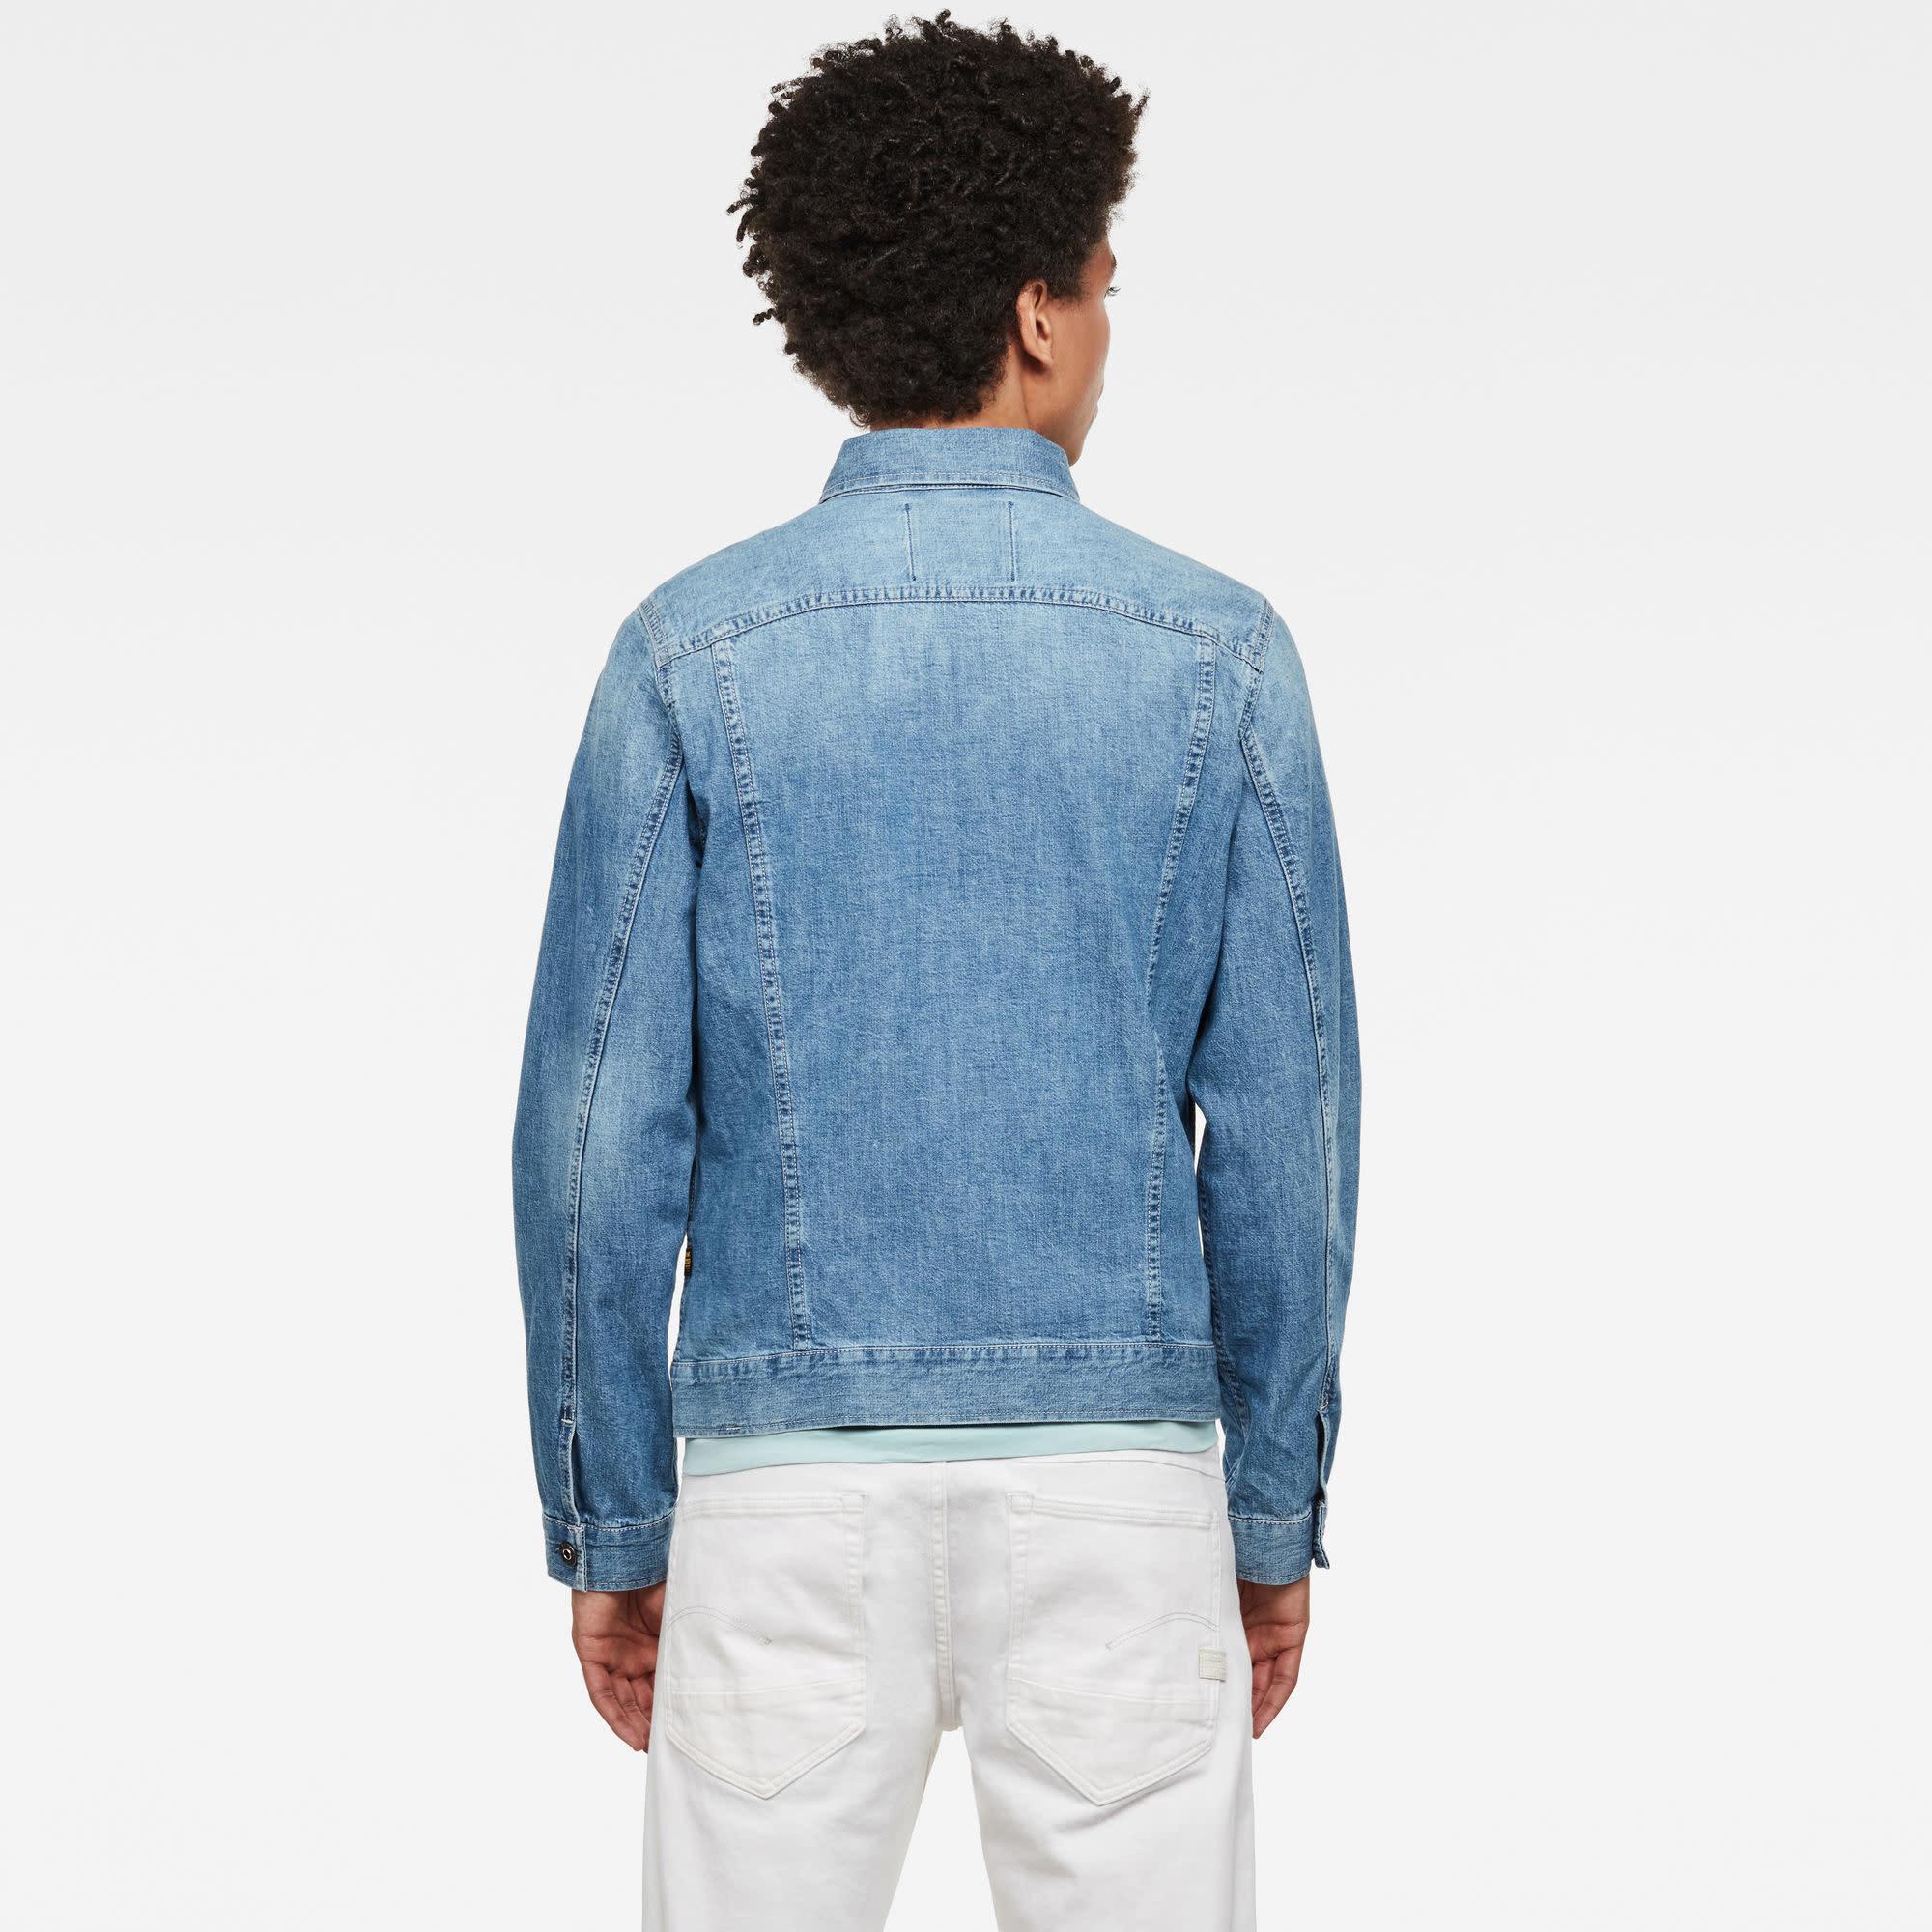 G-Star G-Star 3301 Slim Denim Jacket B250-B723 Faded orion blue